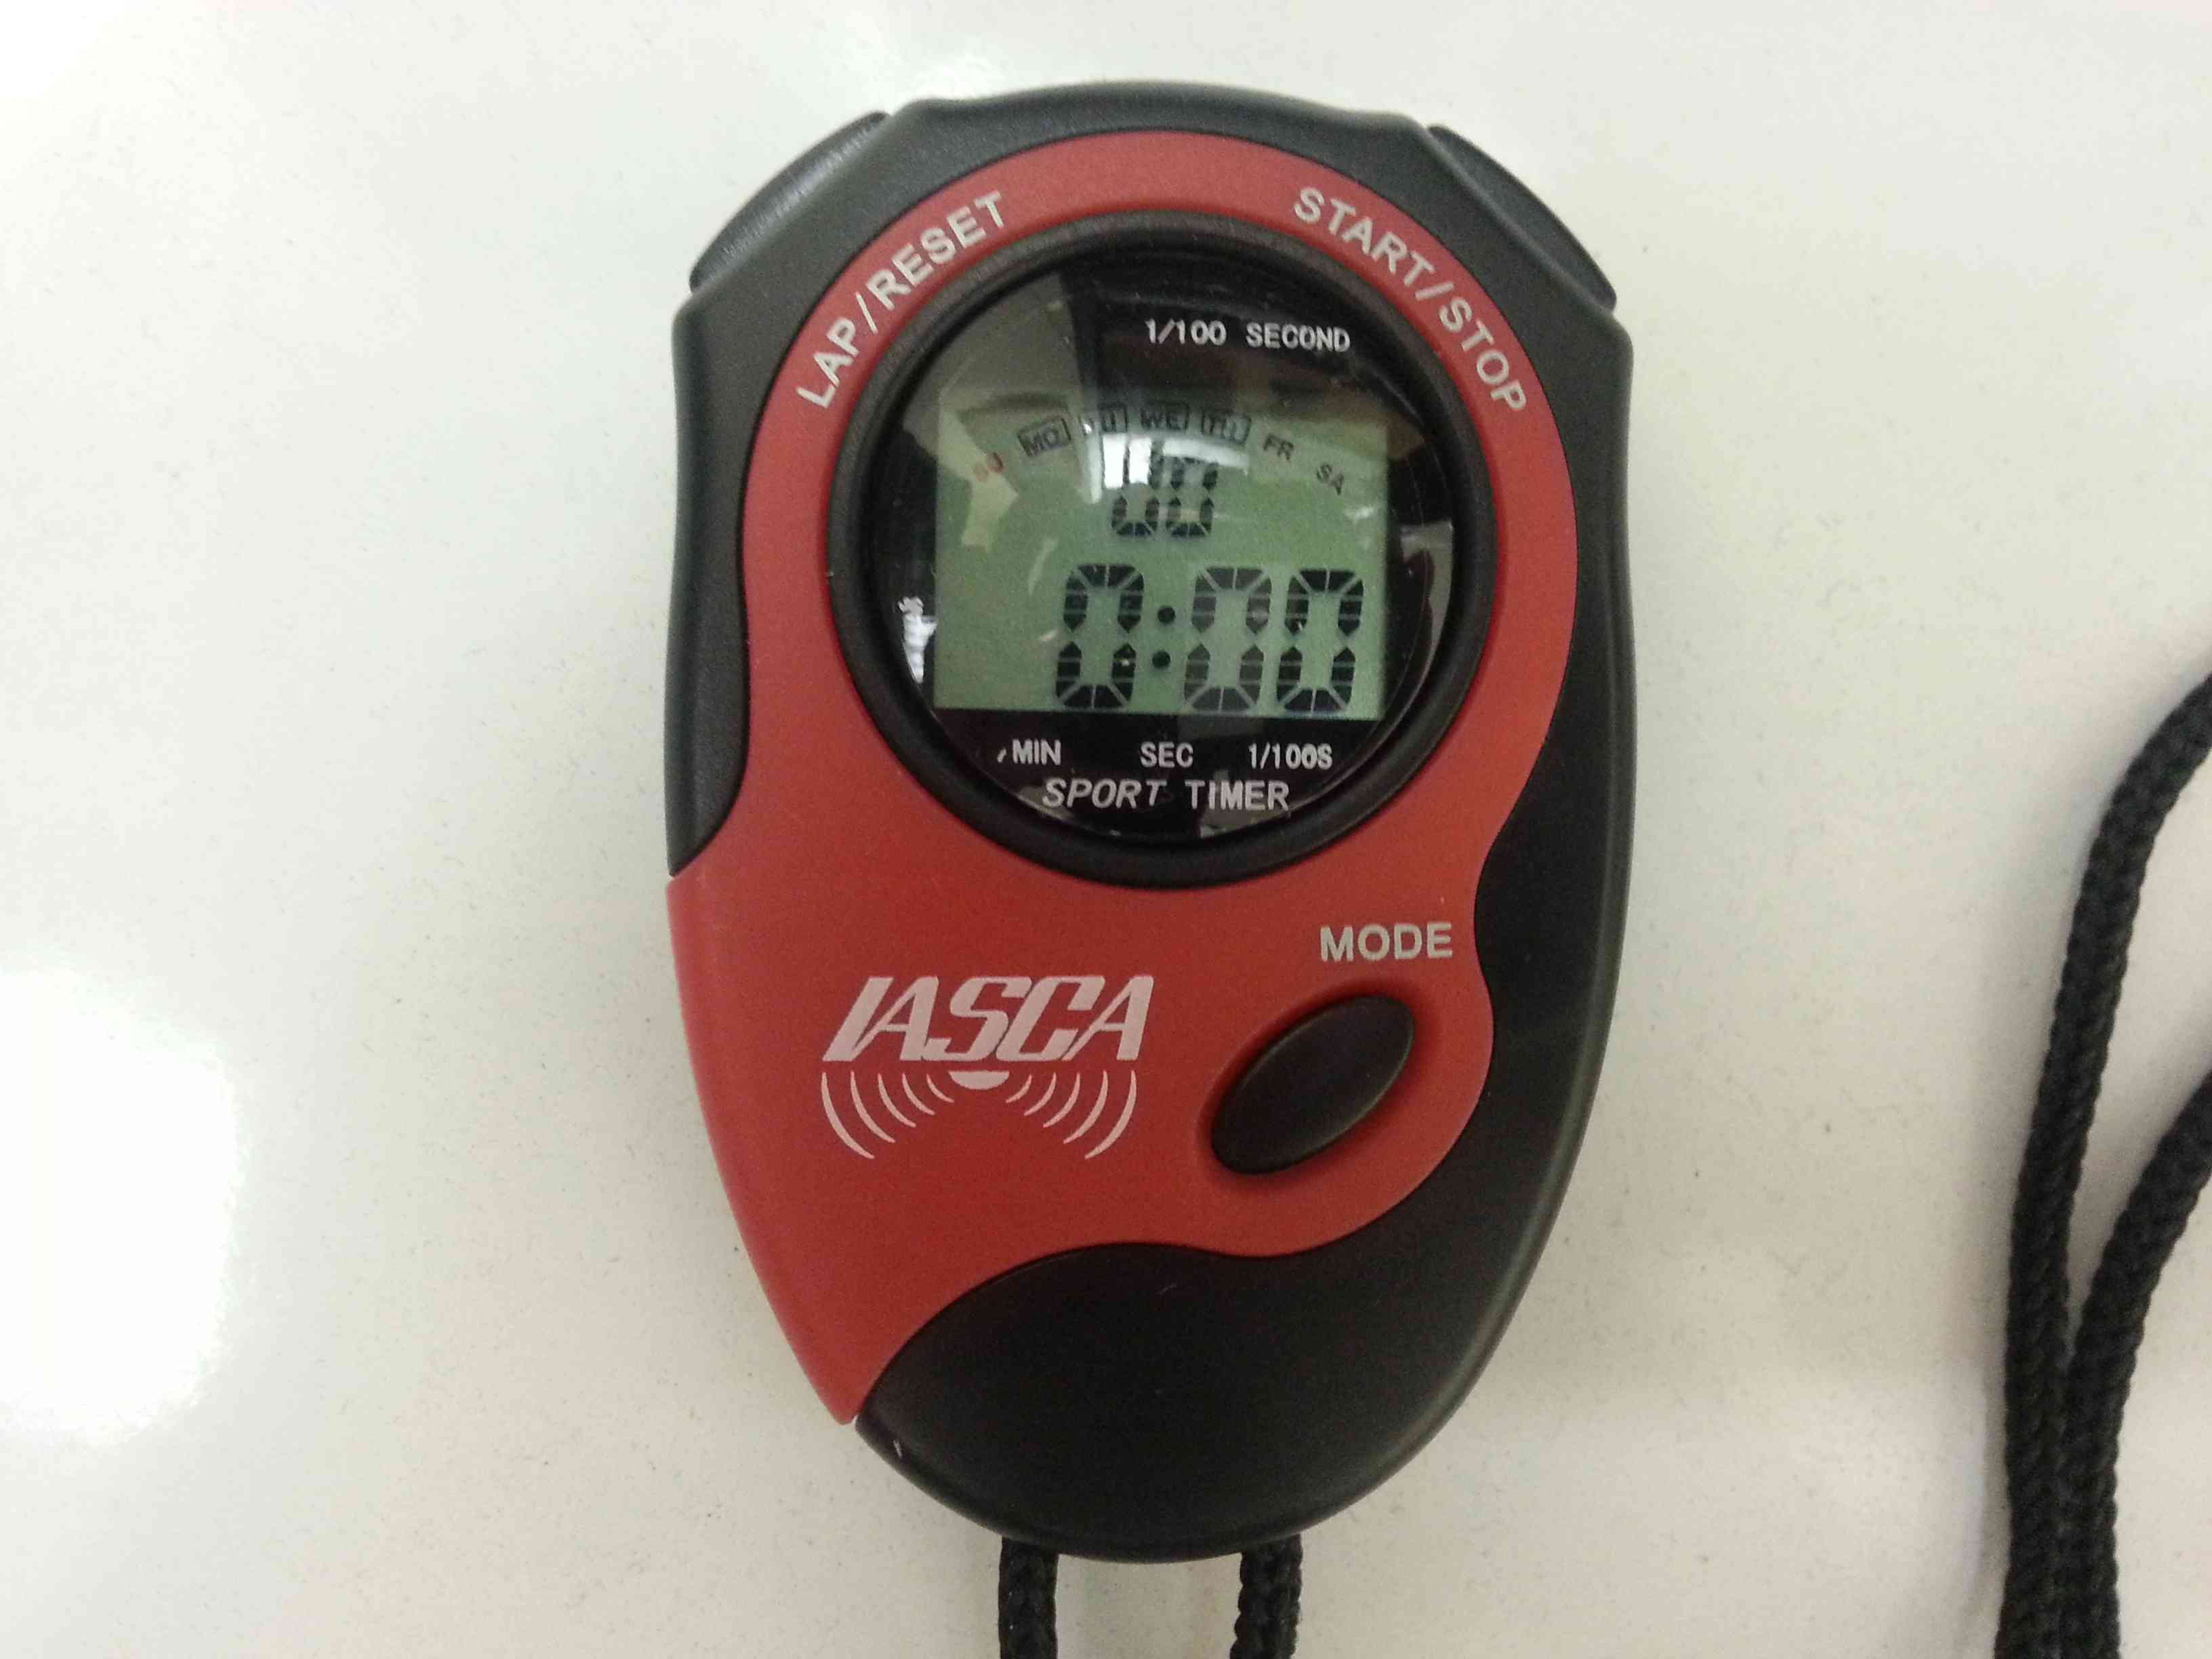 IASCA Stopwatch